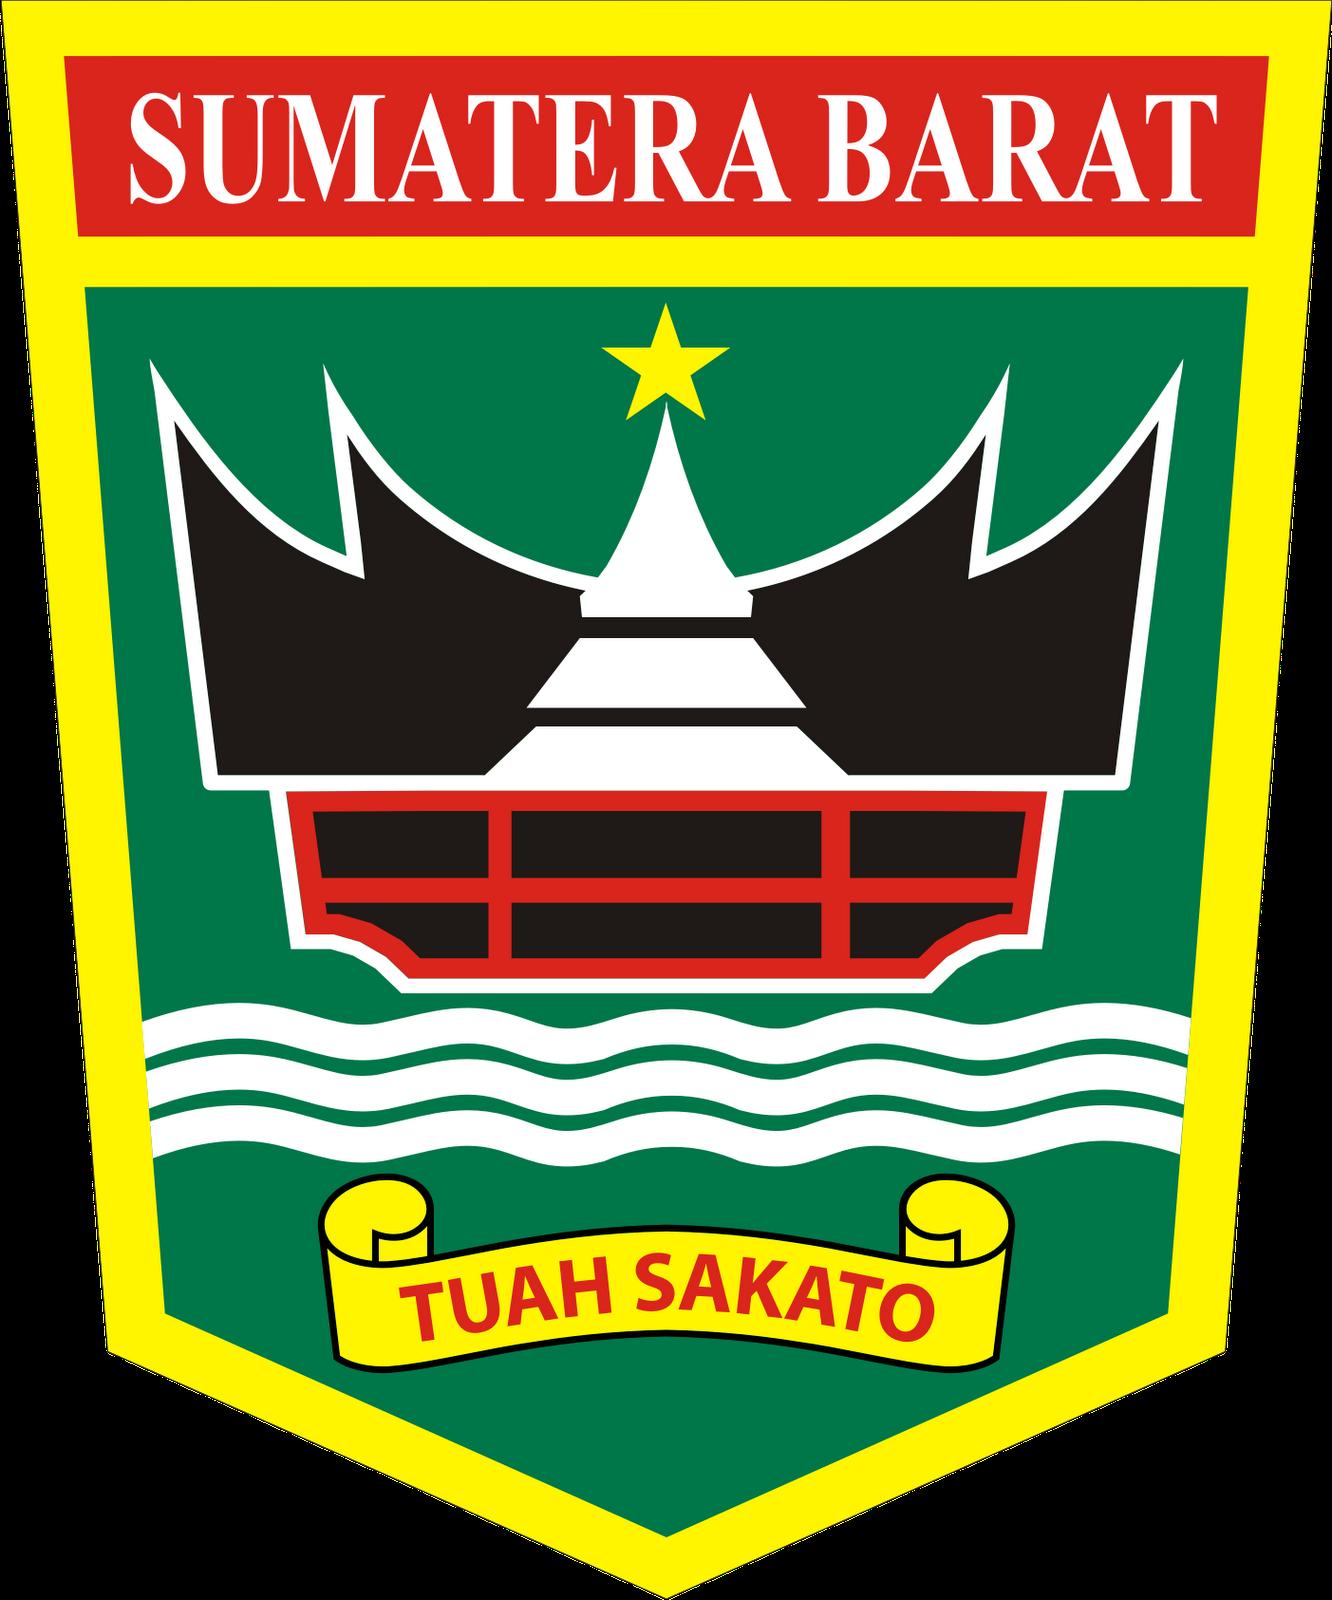 3 Sumatera Barat